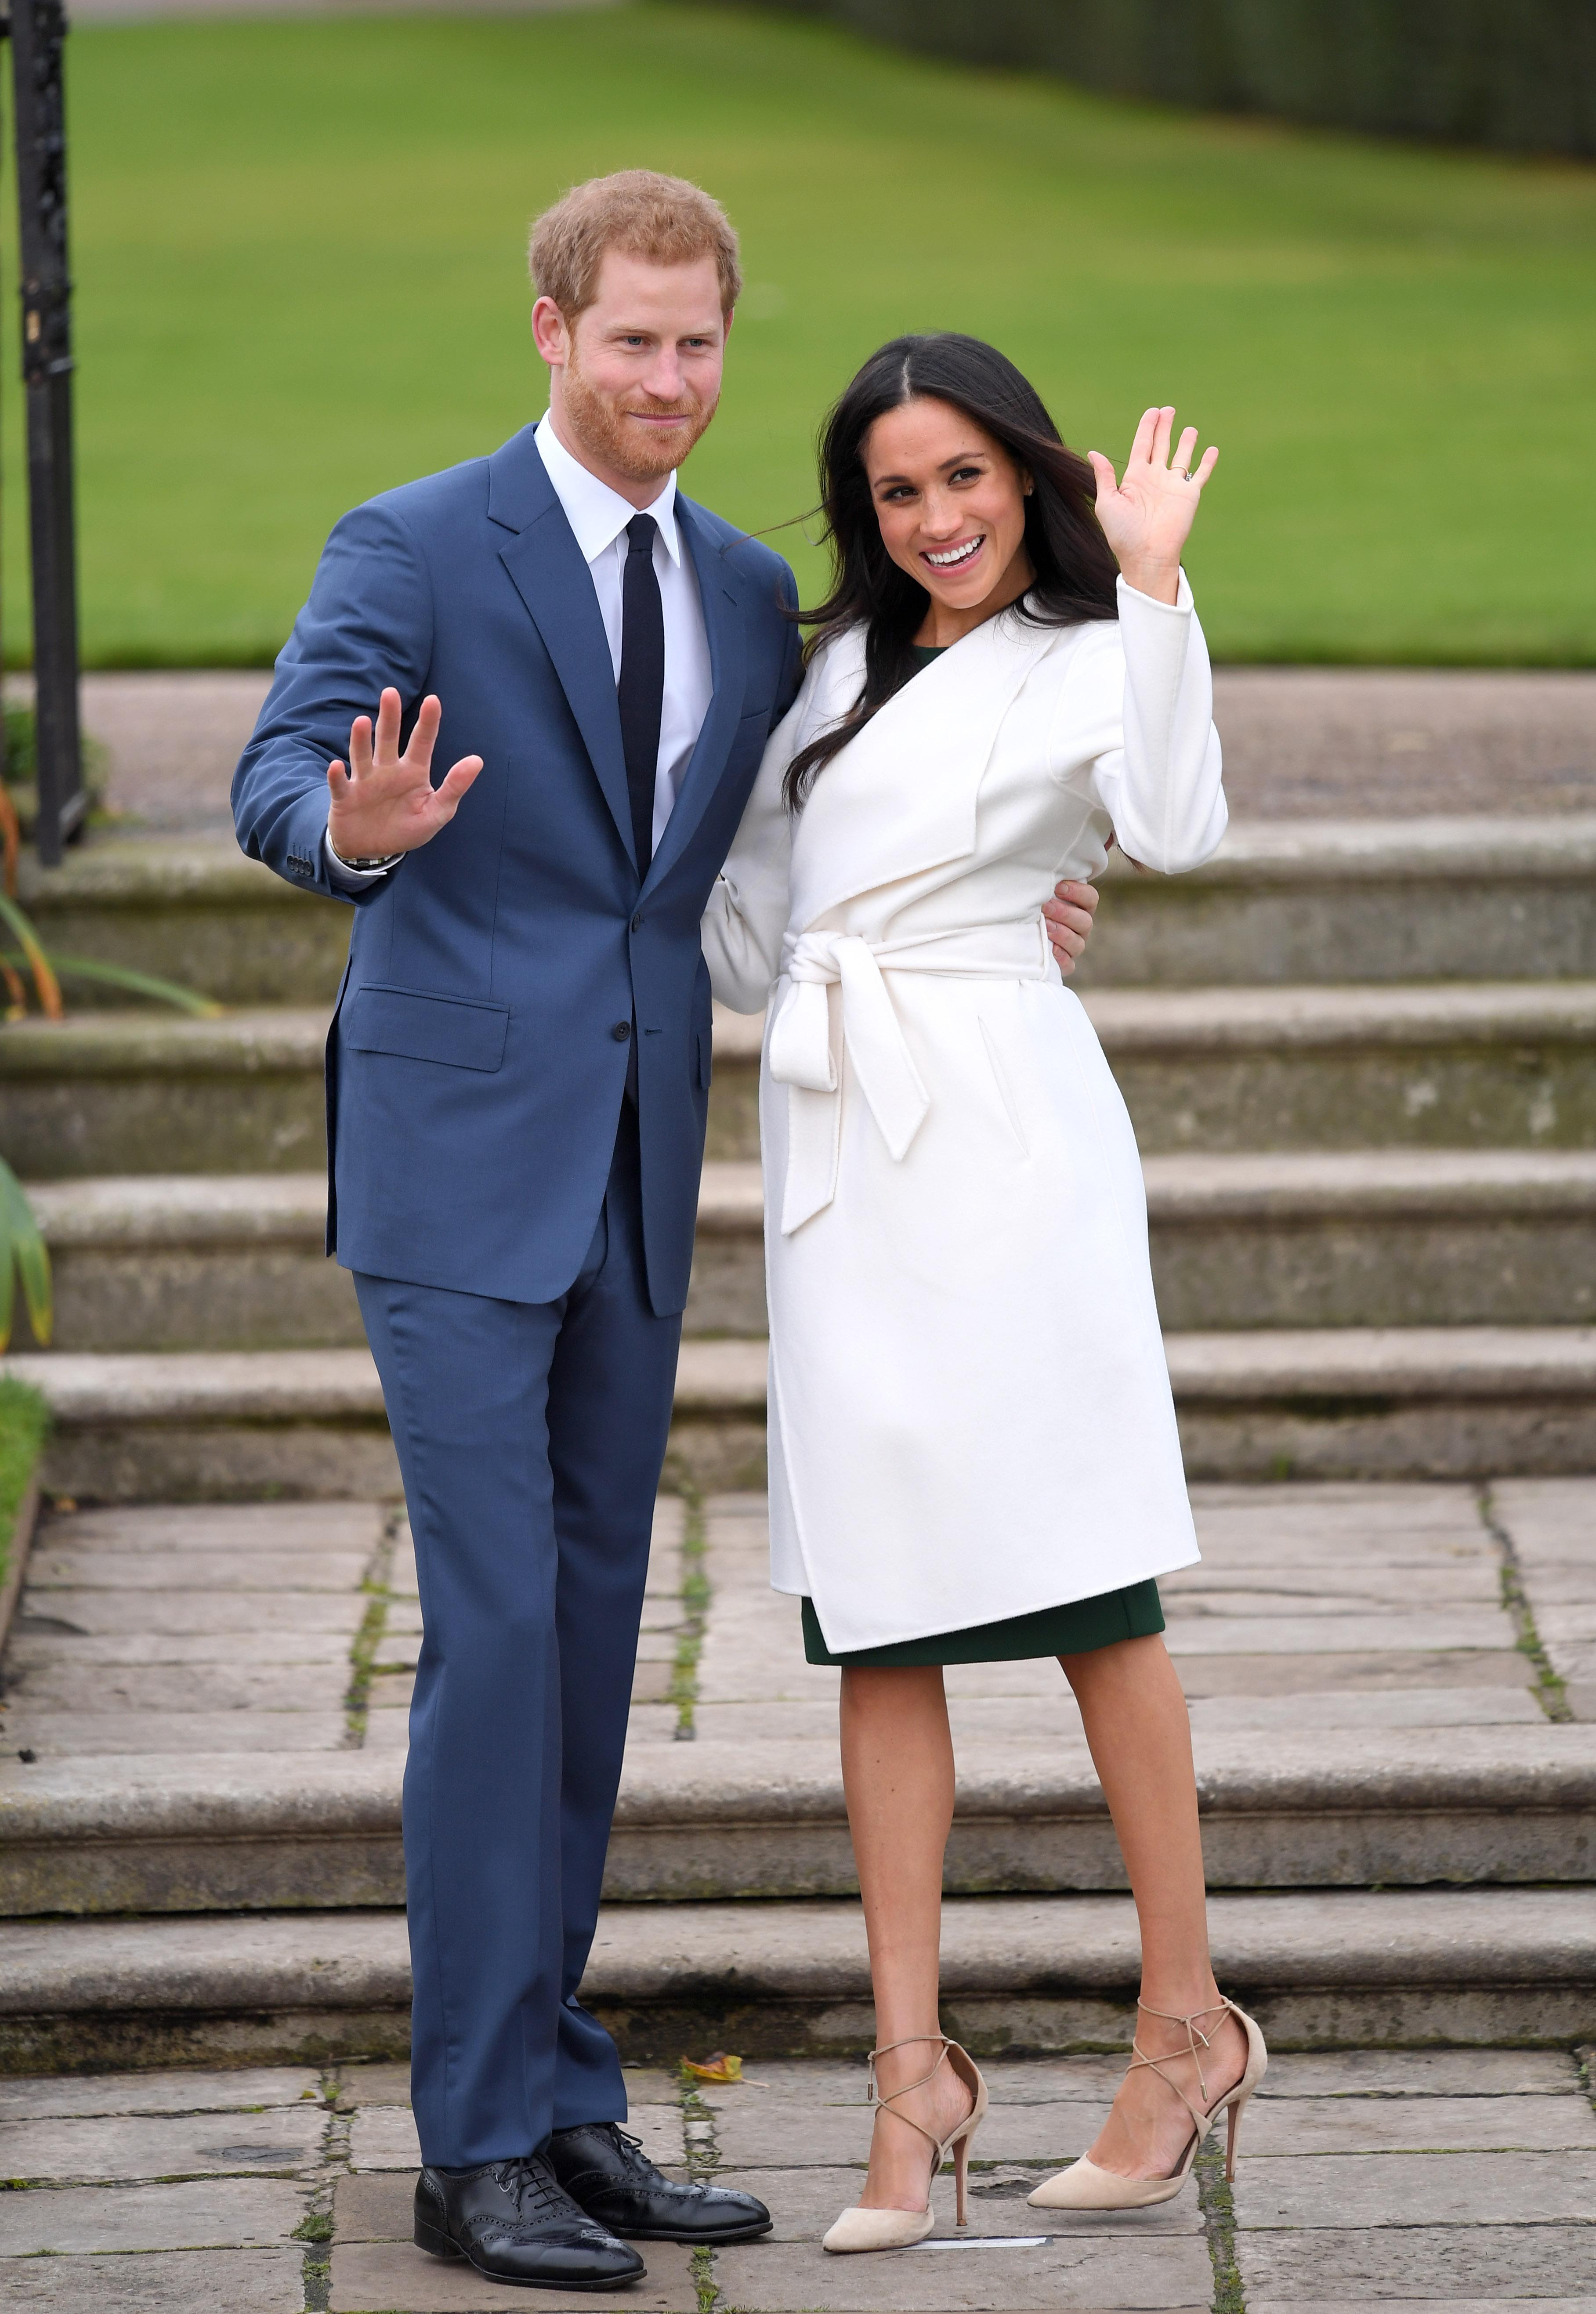 Meghan Markle Kensington Palace Getty Images